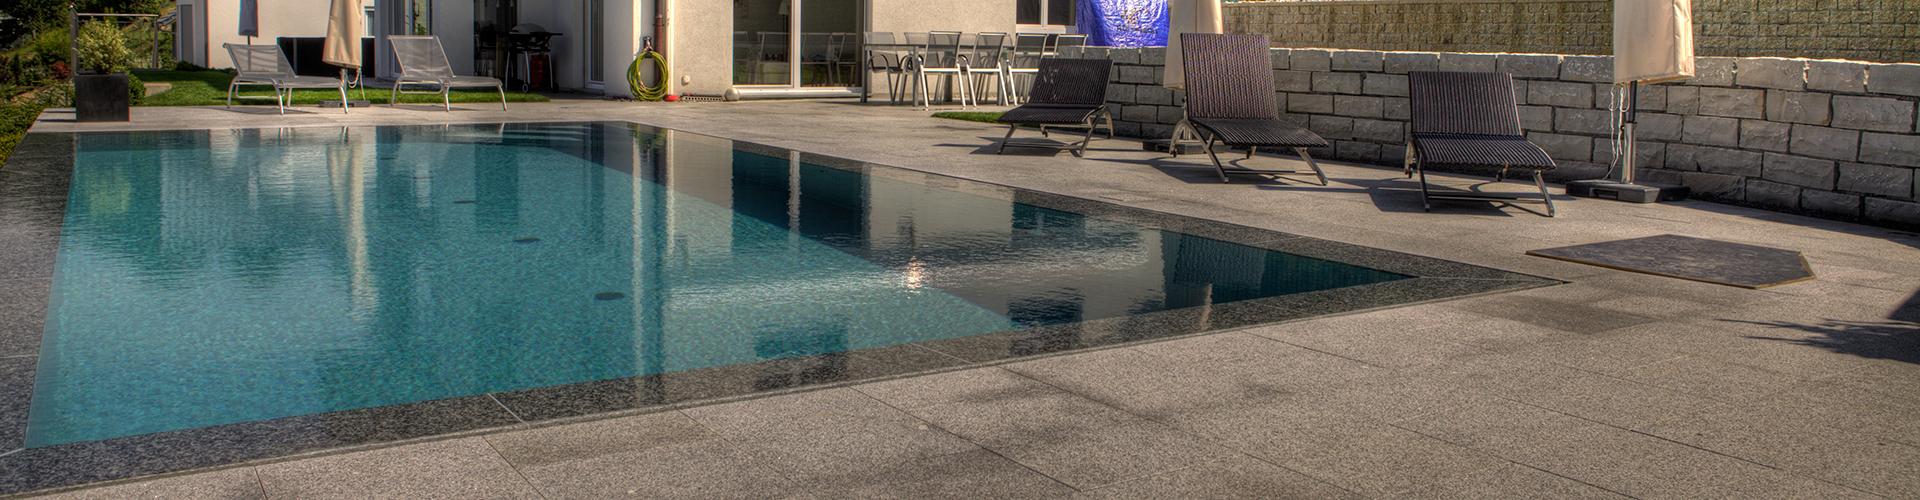 Construction piscine mirroir centerspas for Piscine fond miroir